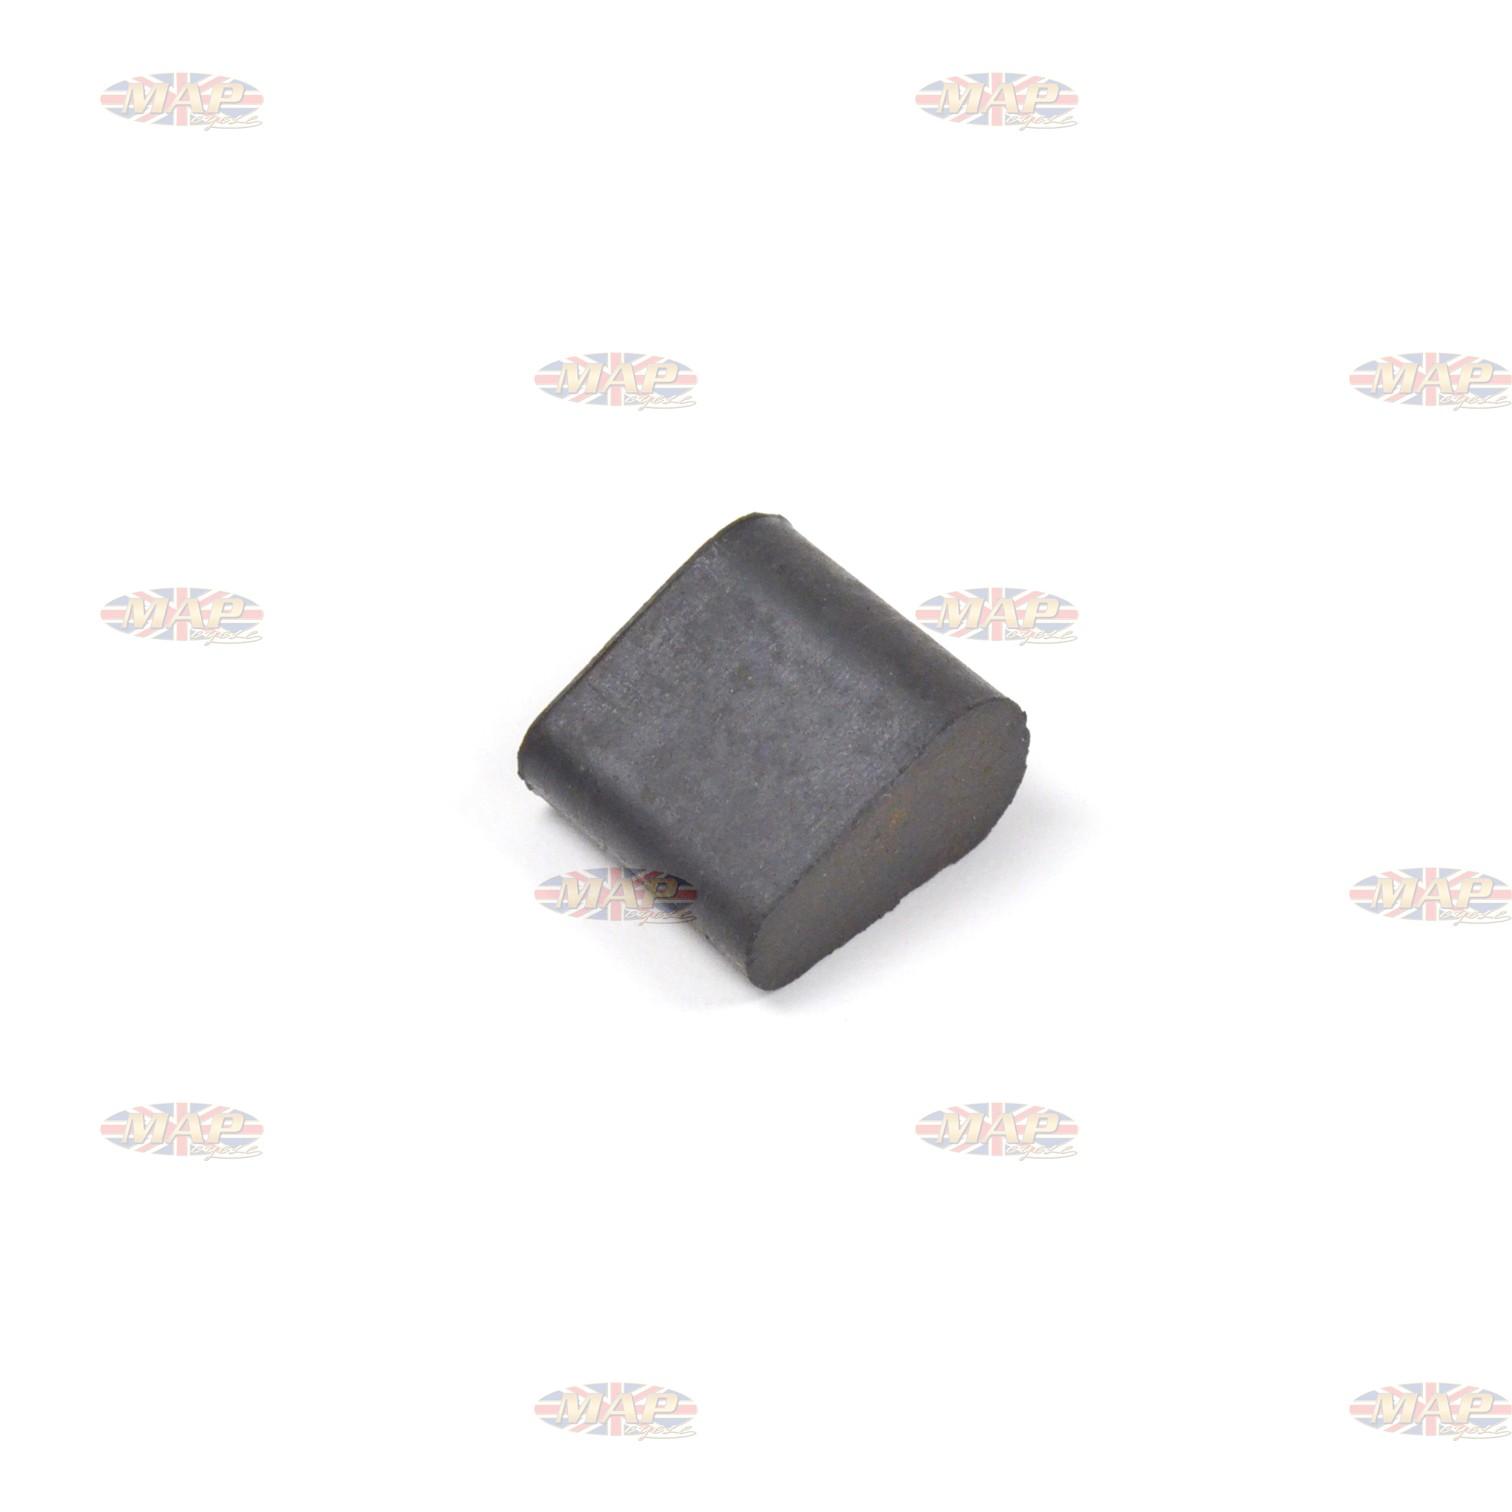 BSA C10 C11 Clutch Small Cush Rubber  29-1990